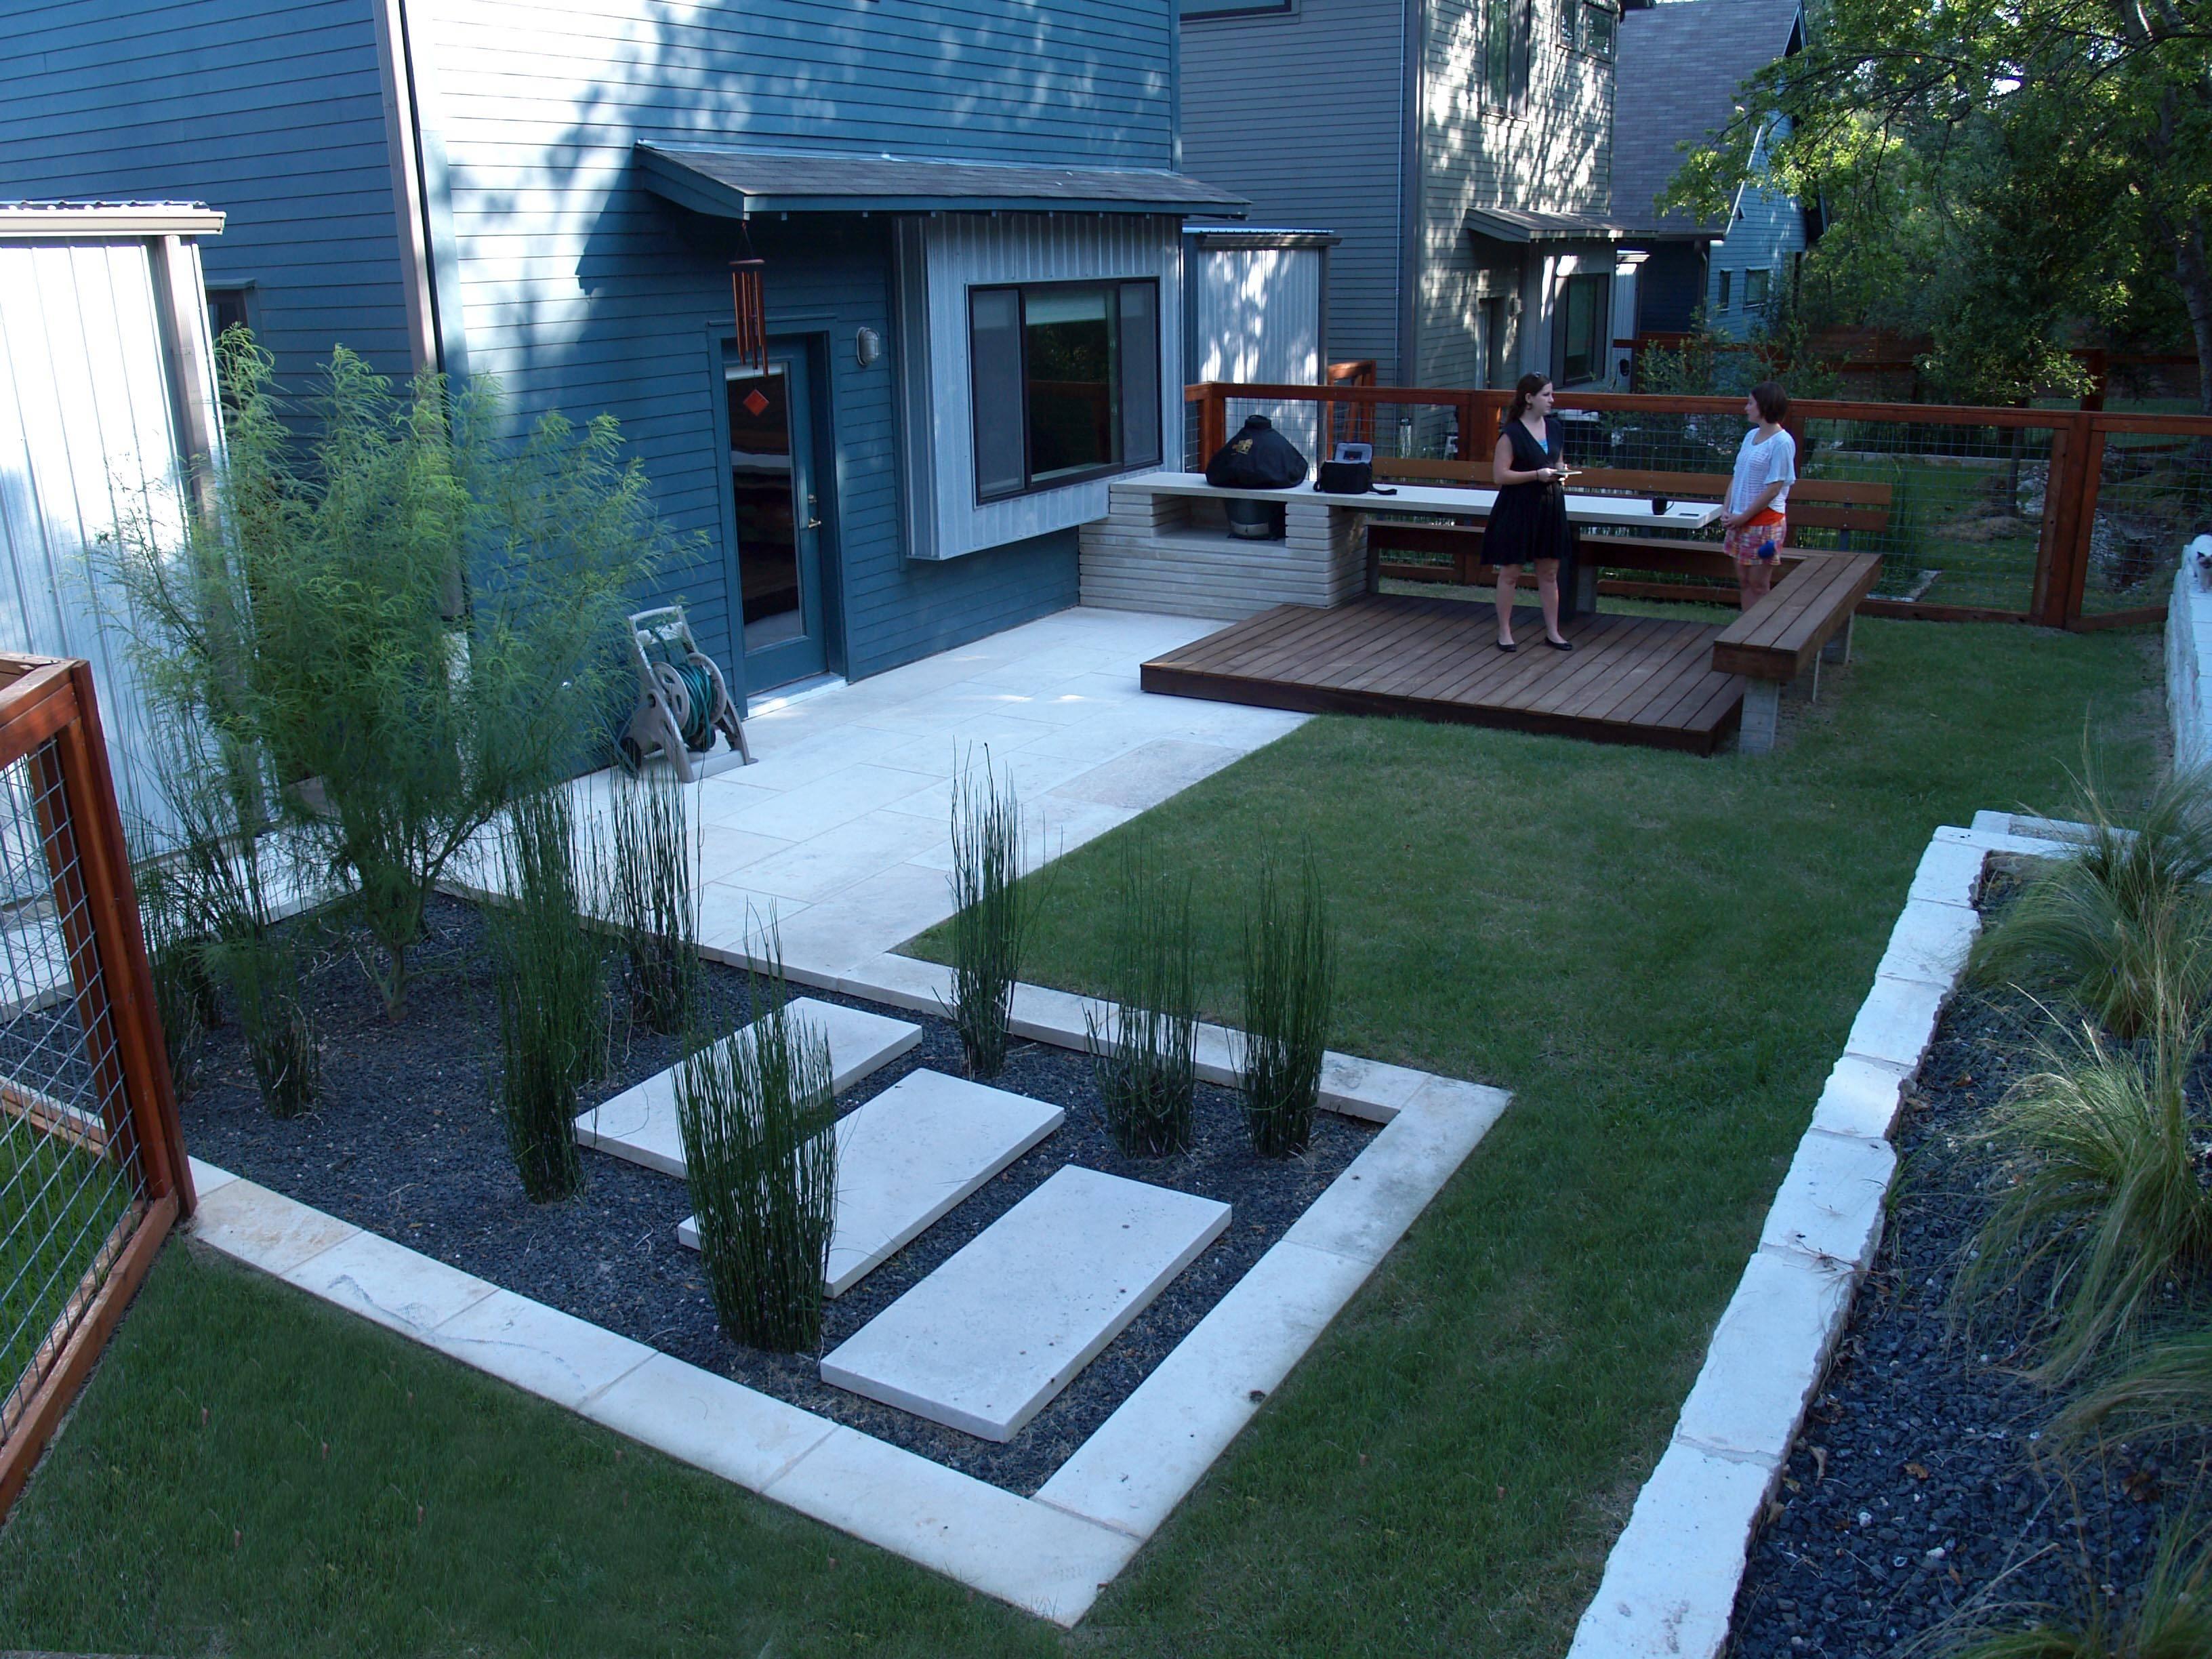 Modern Small Backyard Landscaping Designs Spaces - Cute ... on Cute Small Backyard Ideas id=64321